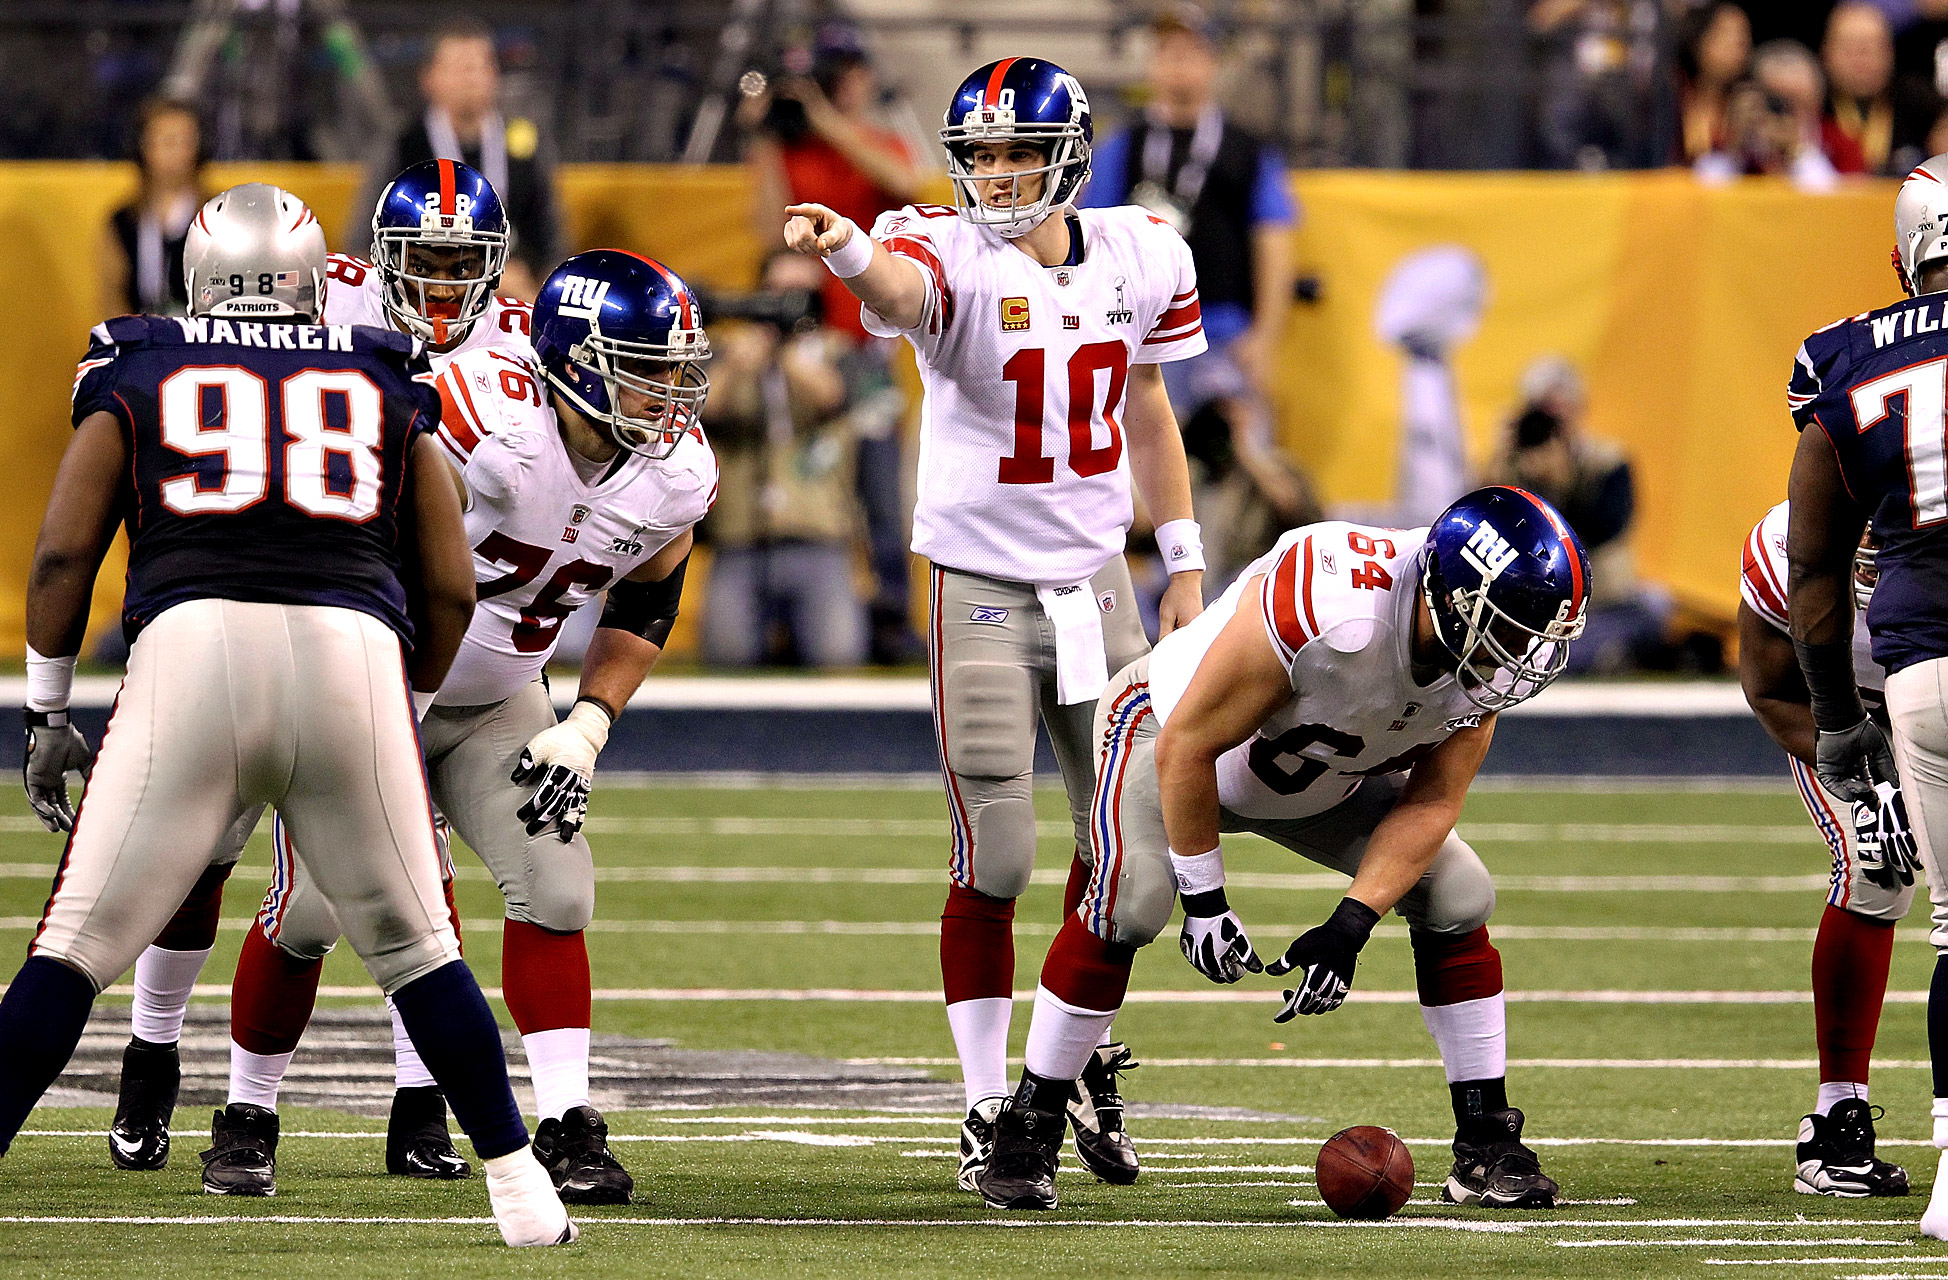 Eli Manning - Super Bowl XLVI (30/40, 296 yards, 1 TD)